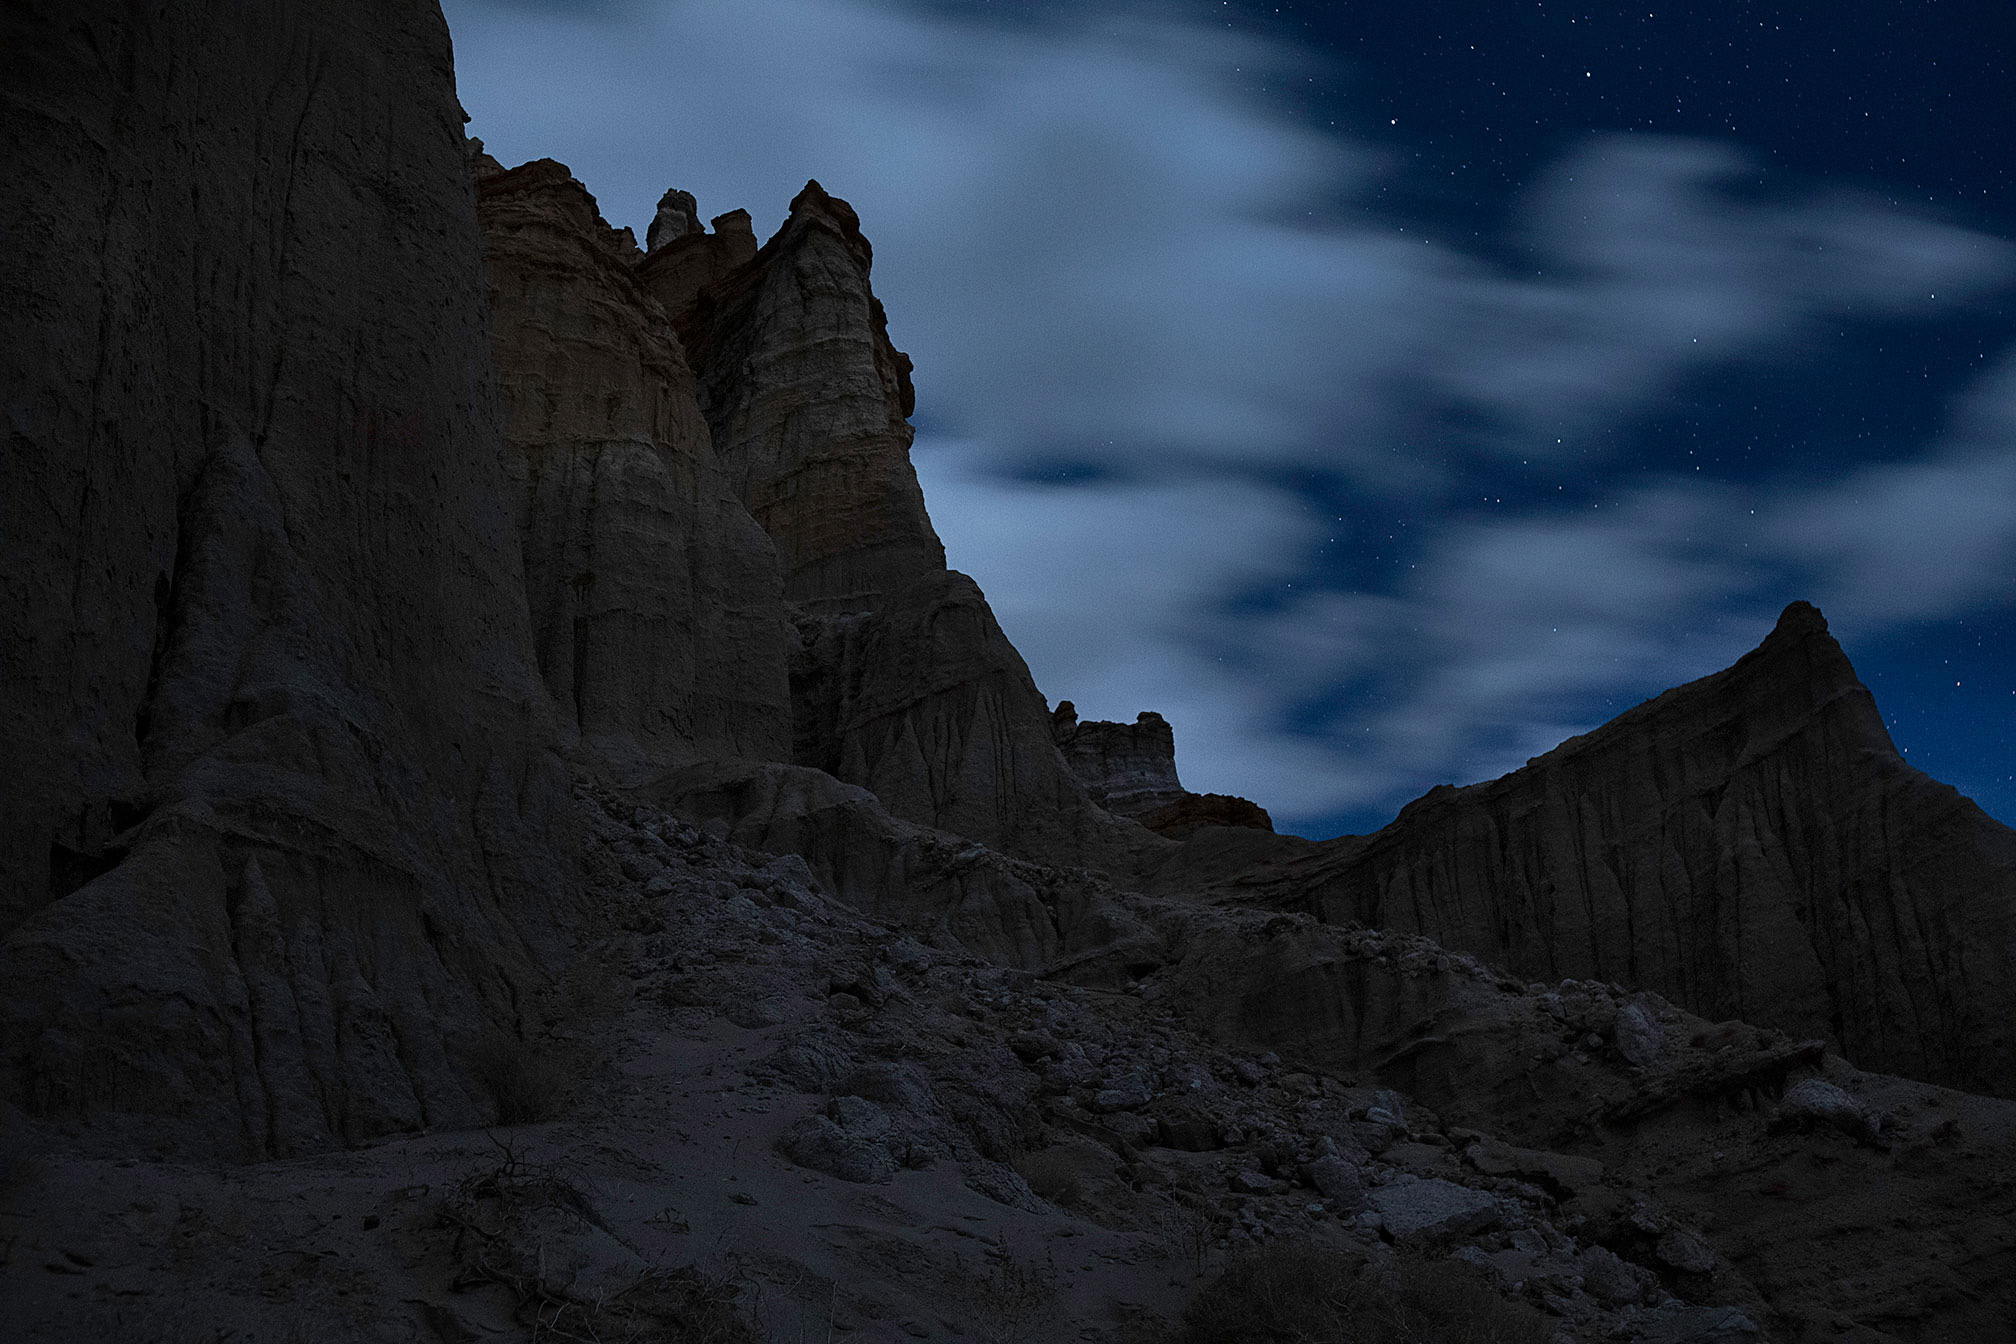 Cliffs under the . night sky.